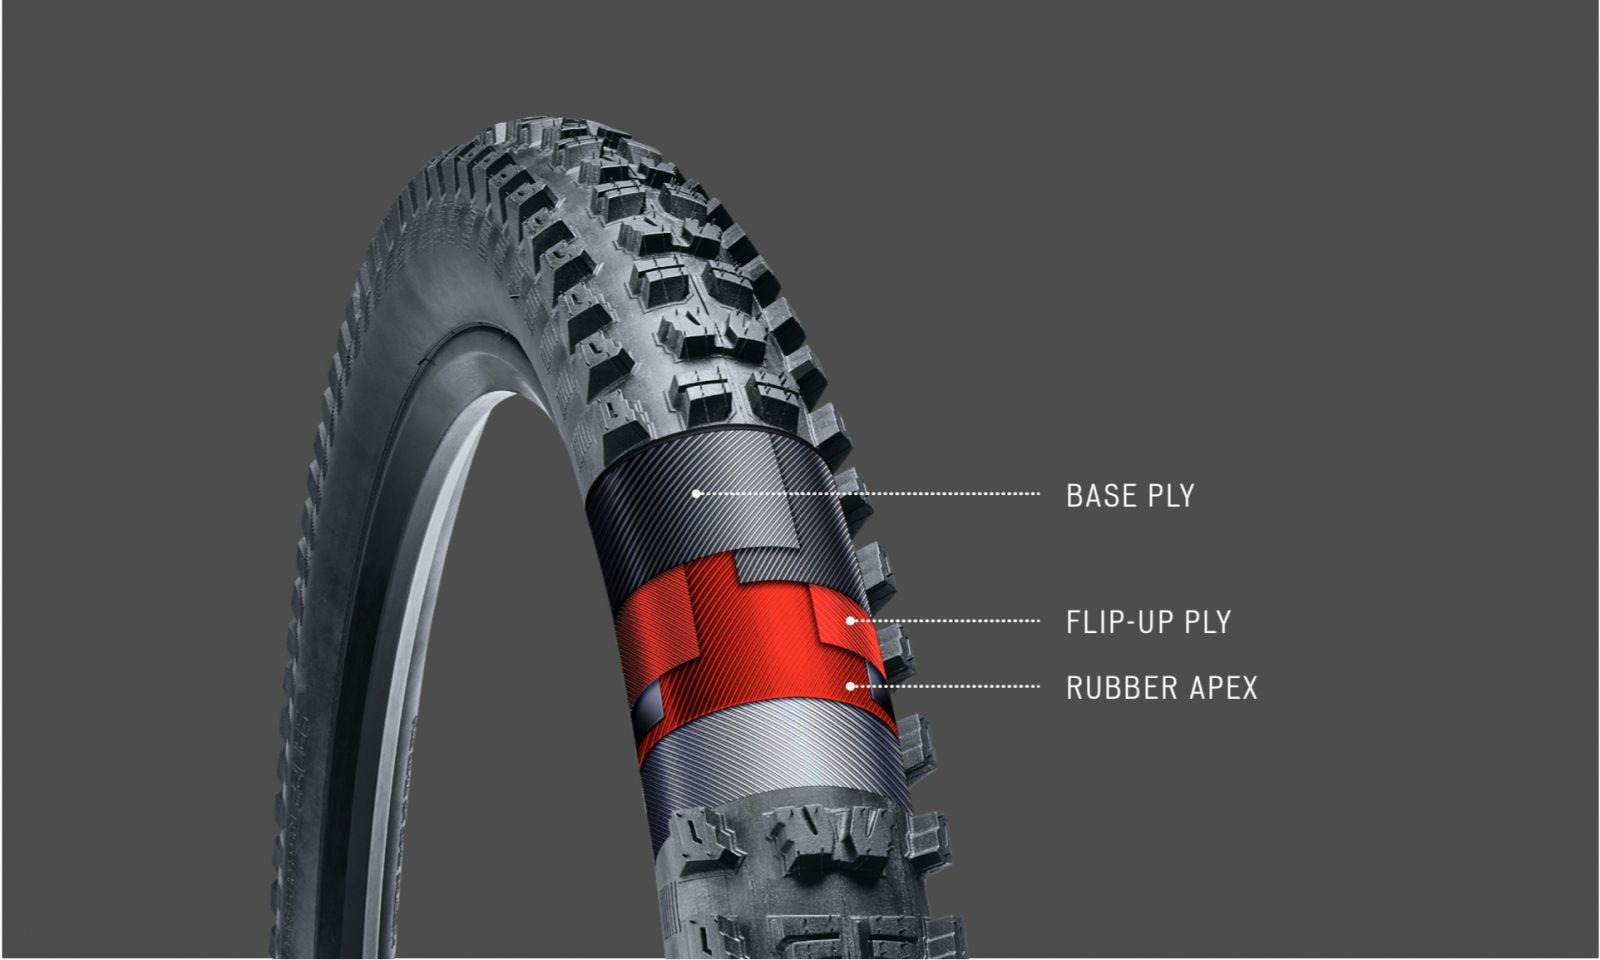 MTB-MAG COM - Mountain Bike Magazine | Specialized Announces New